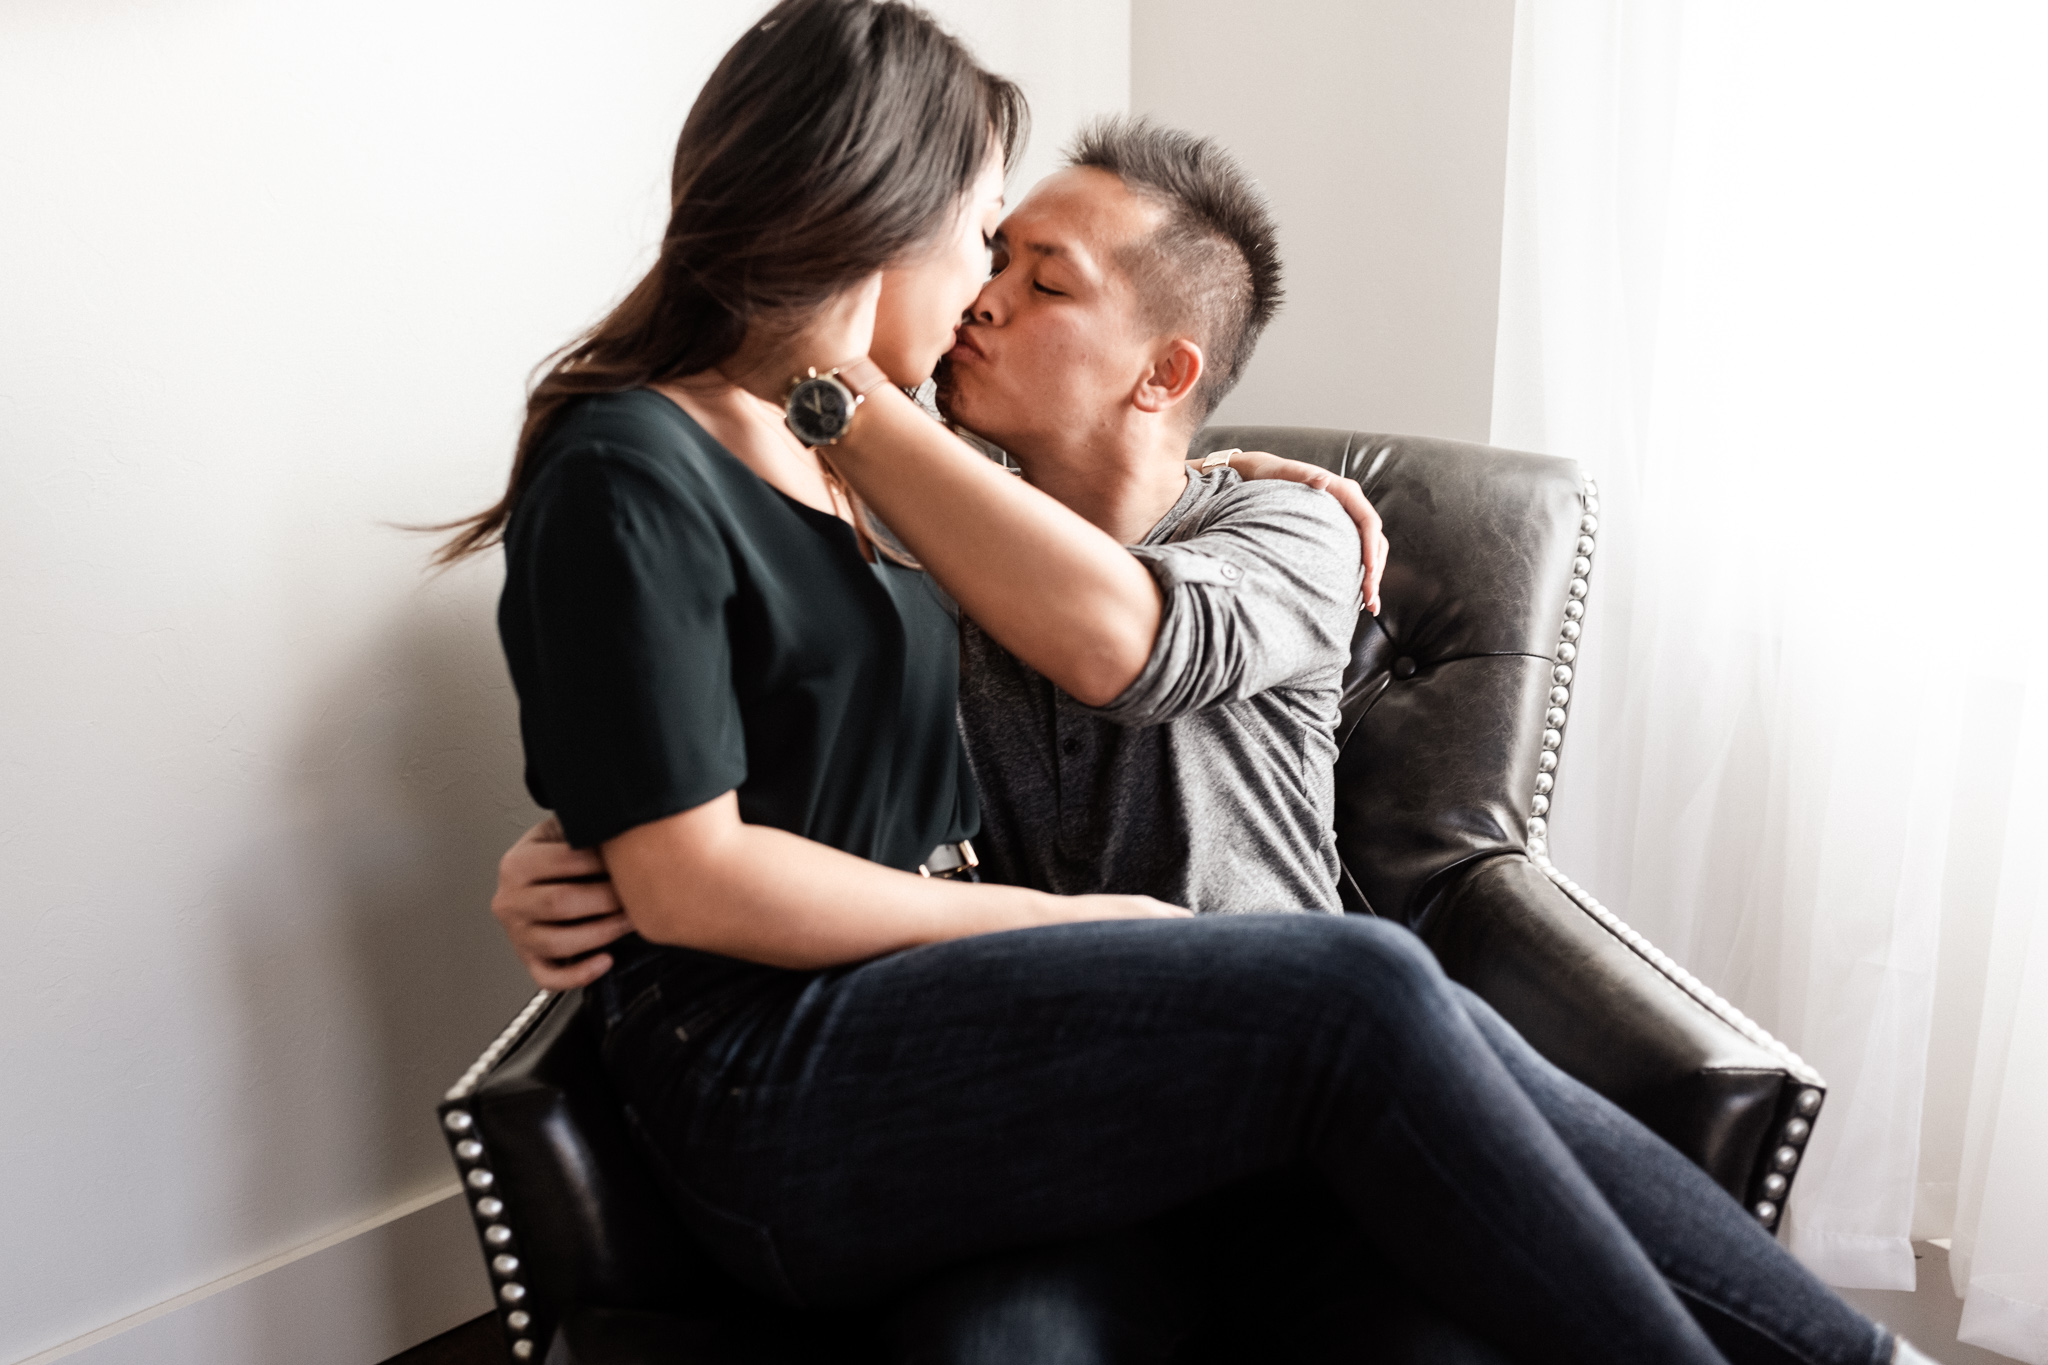 Hieu + Teresa | Colorful Romantic Downtown Engagements | Oklahoma Wedding Photographer-2.jpg